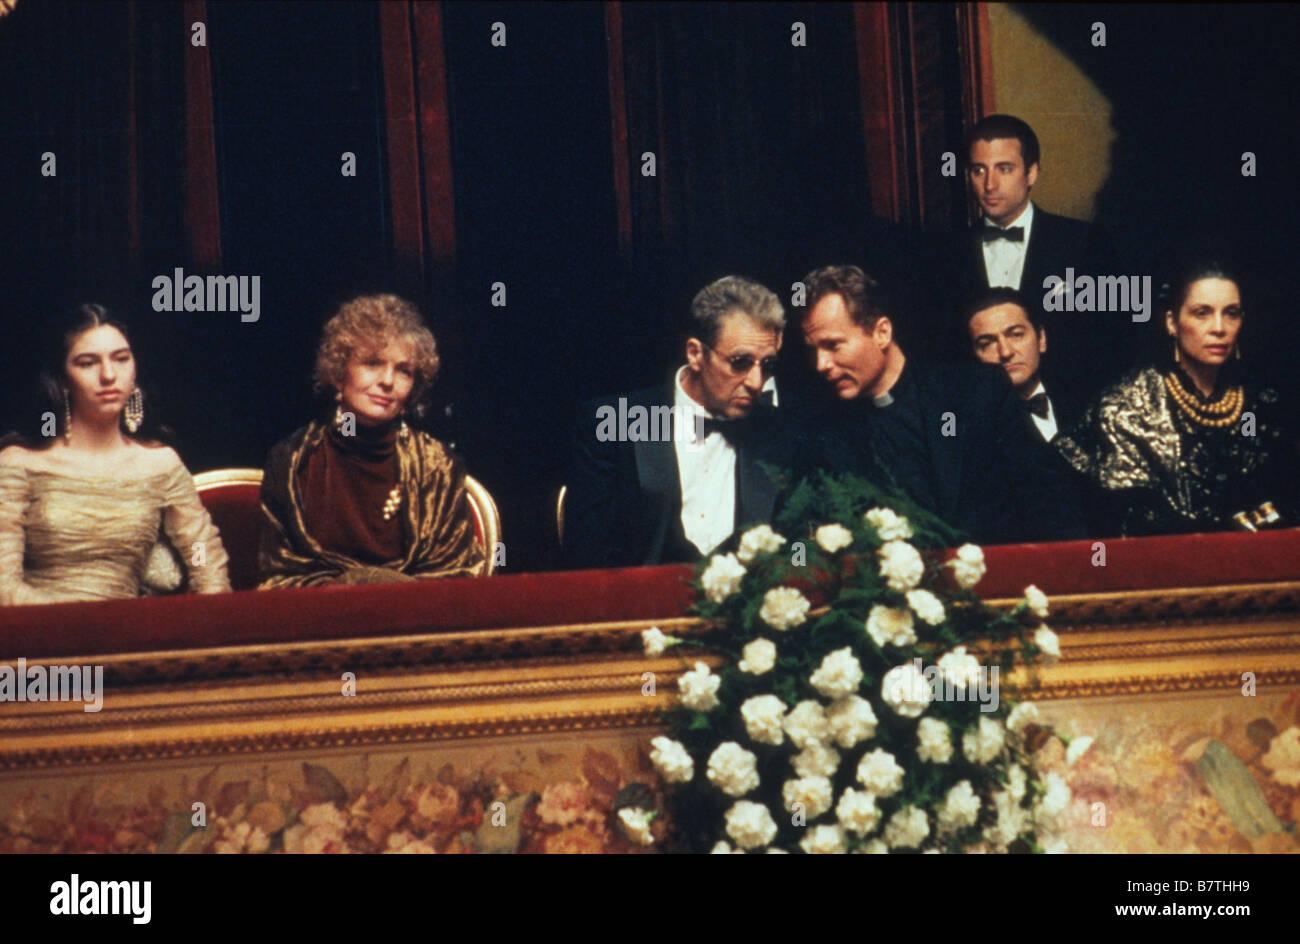 The Godfather: Part III  Year: 1990  USA Director: Francis Ford Coppola Sofia Coppola , Diane Keaton, Al Pacino Stock Photo